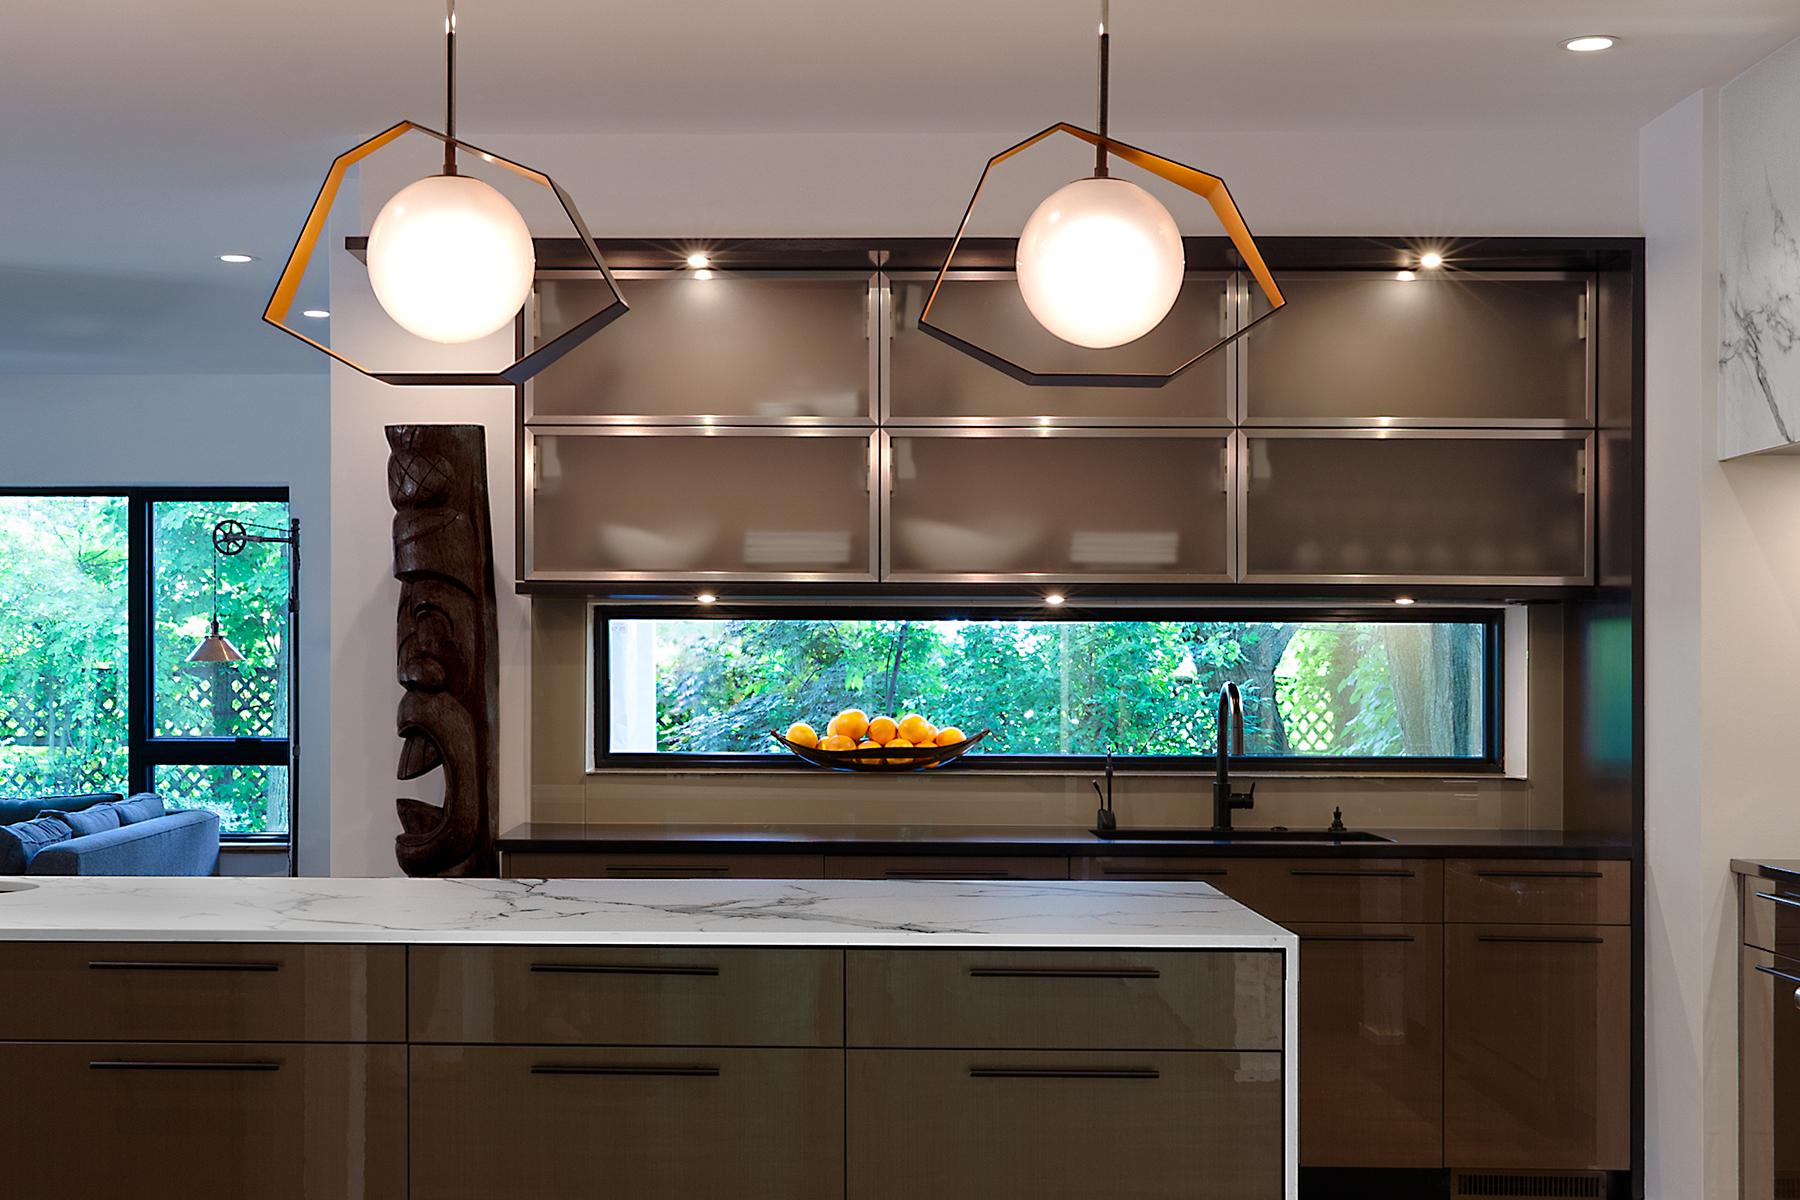 sq-kitchen-2.jpg